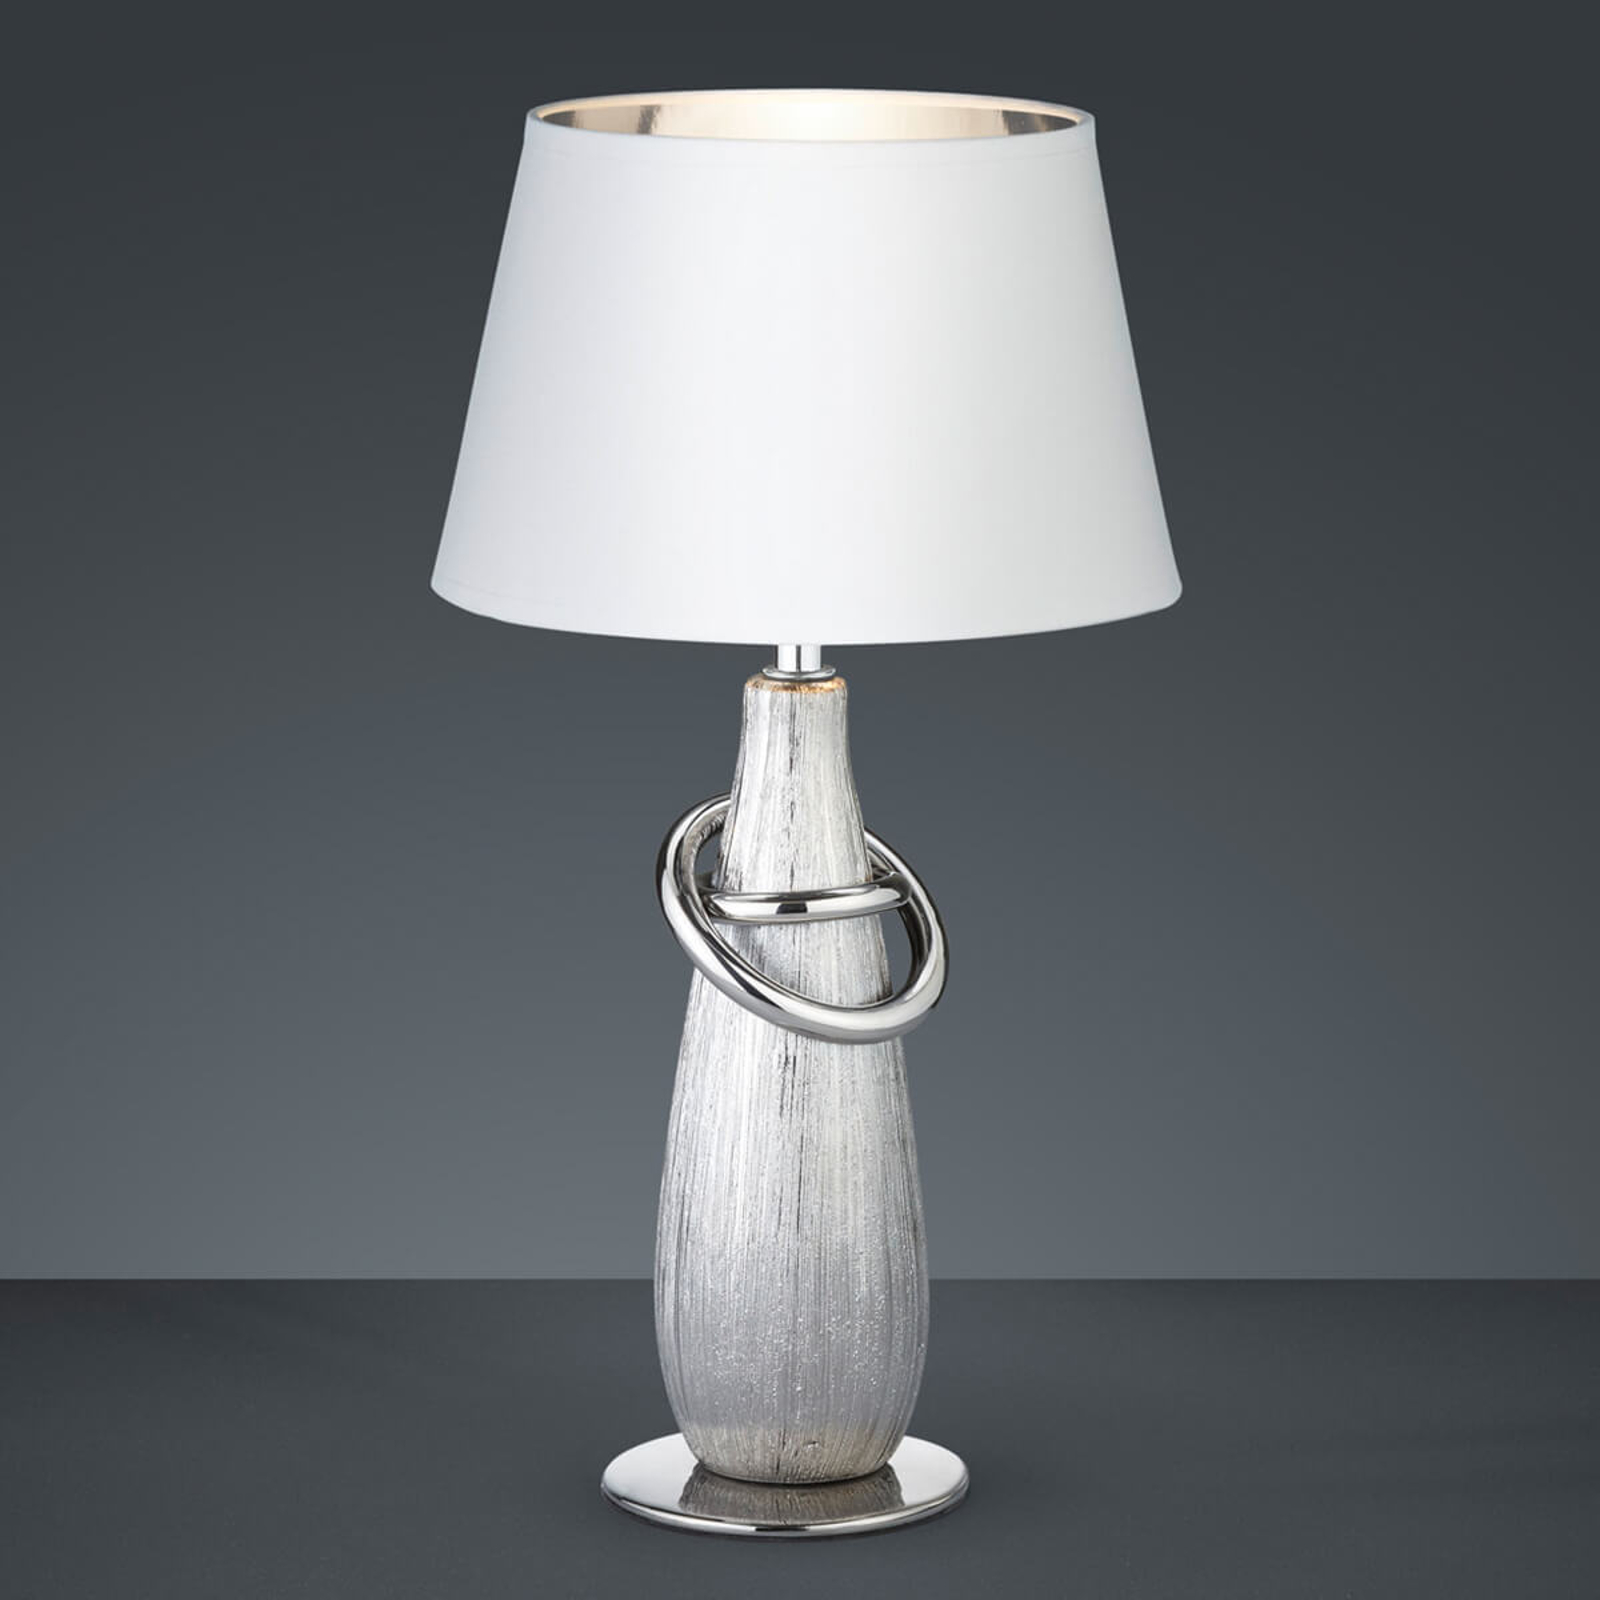 Thebes – bordlampe med sølvfarget keramikkfot